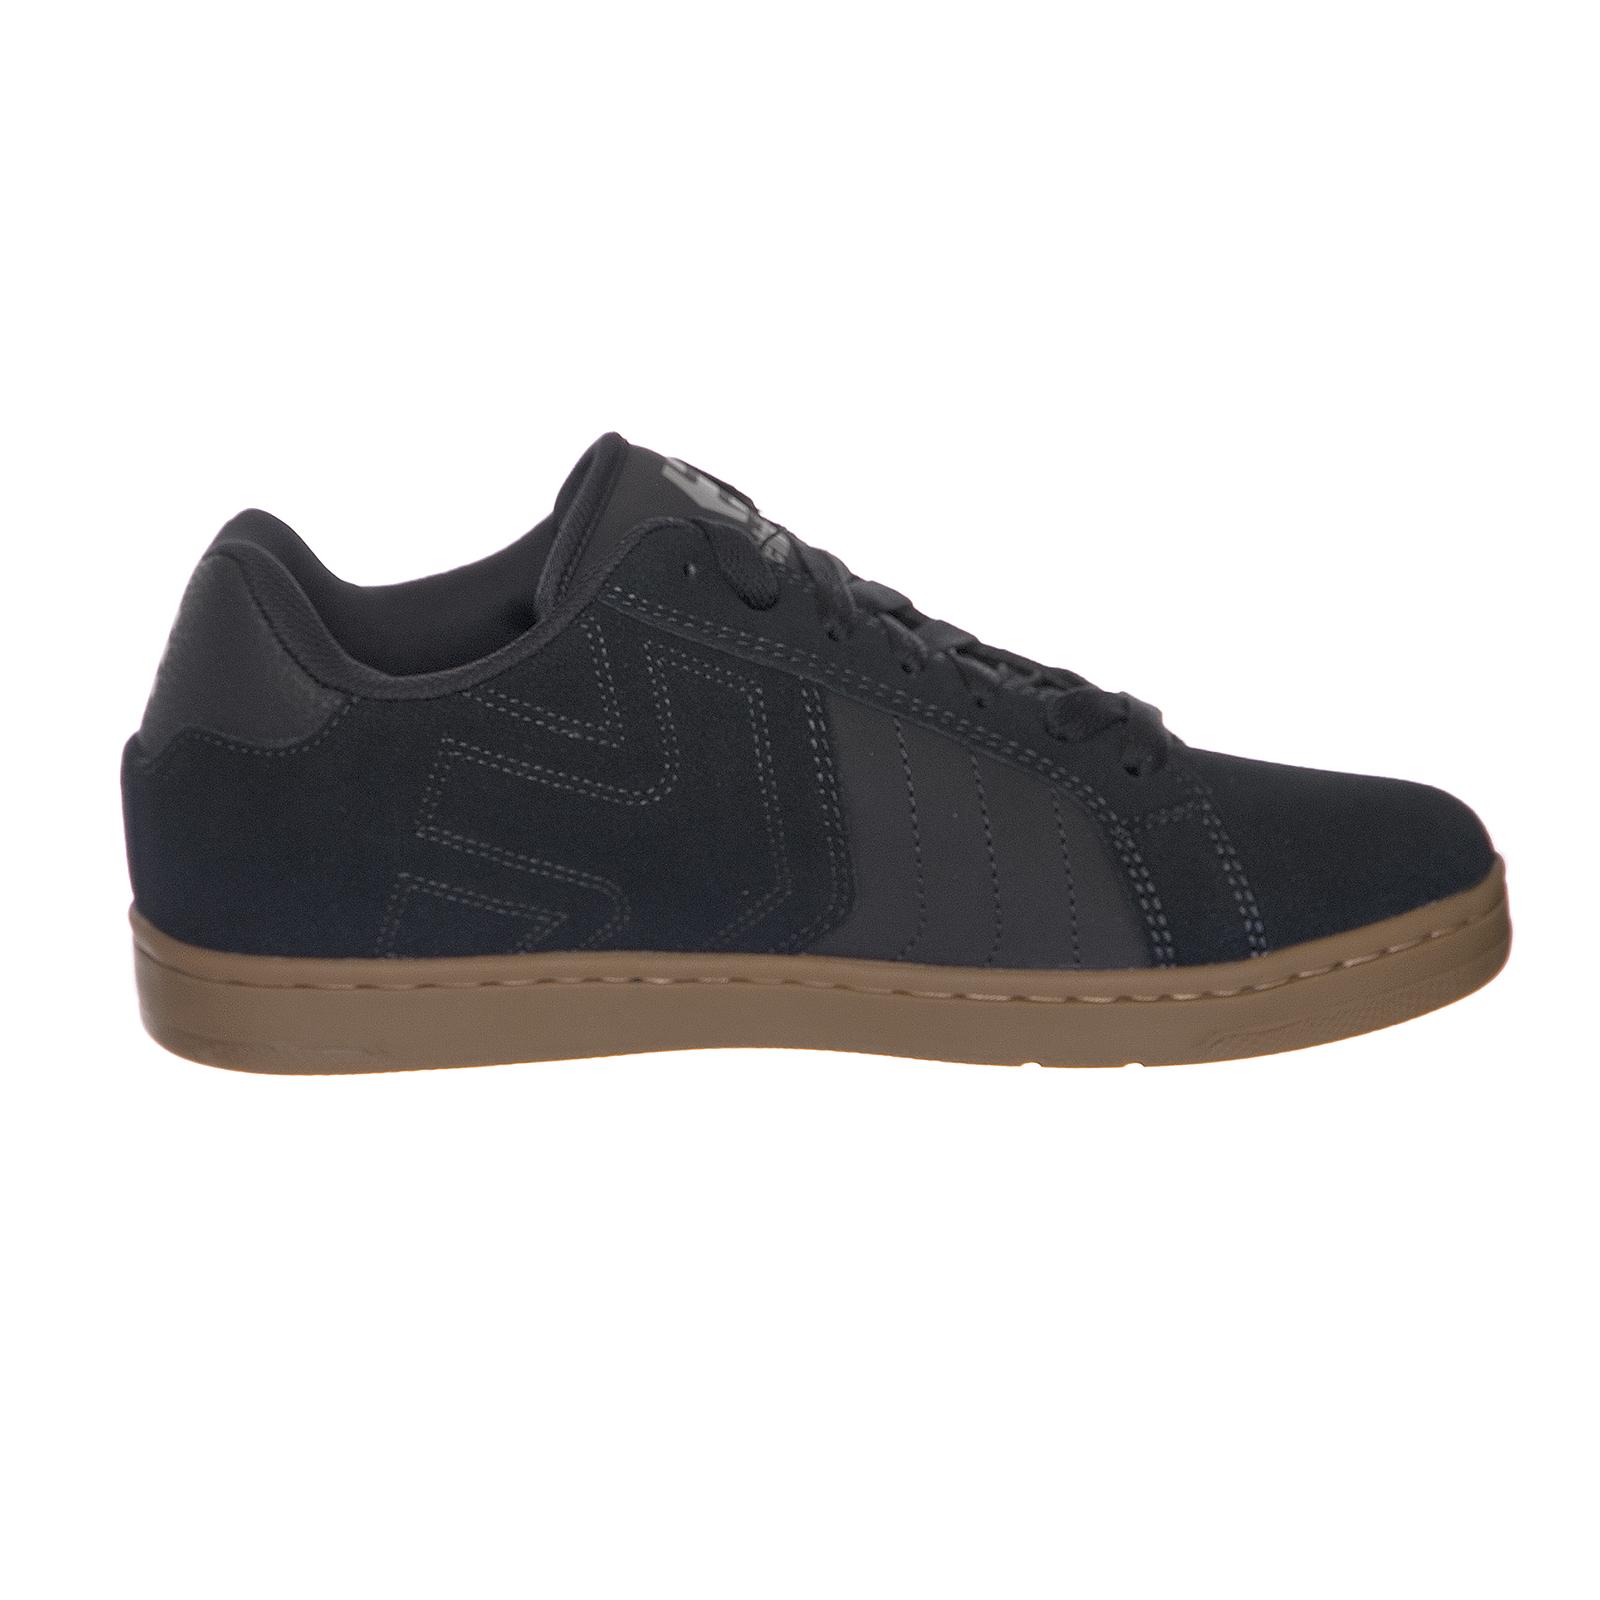 Etnies Sneakers Navy/Gris/Gum Fader 2 Navy/Gris/Gum Sneakers Azul d0e253